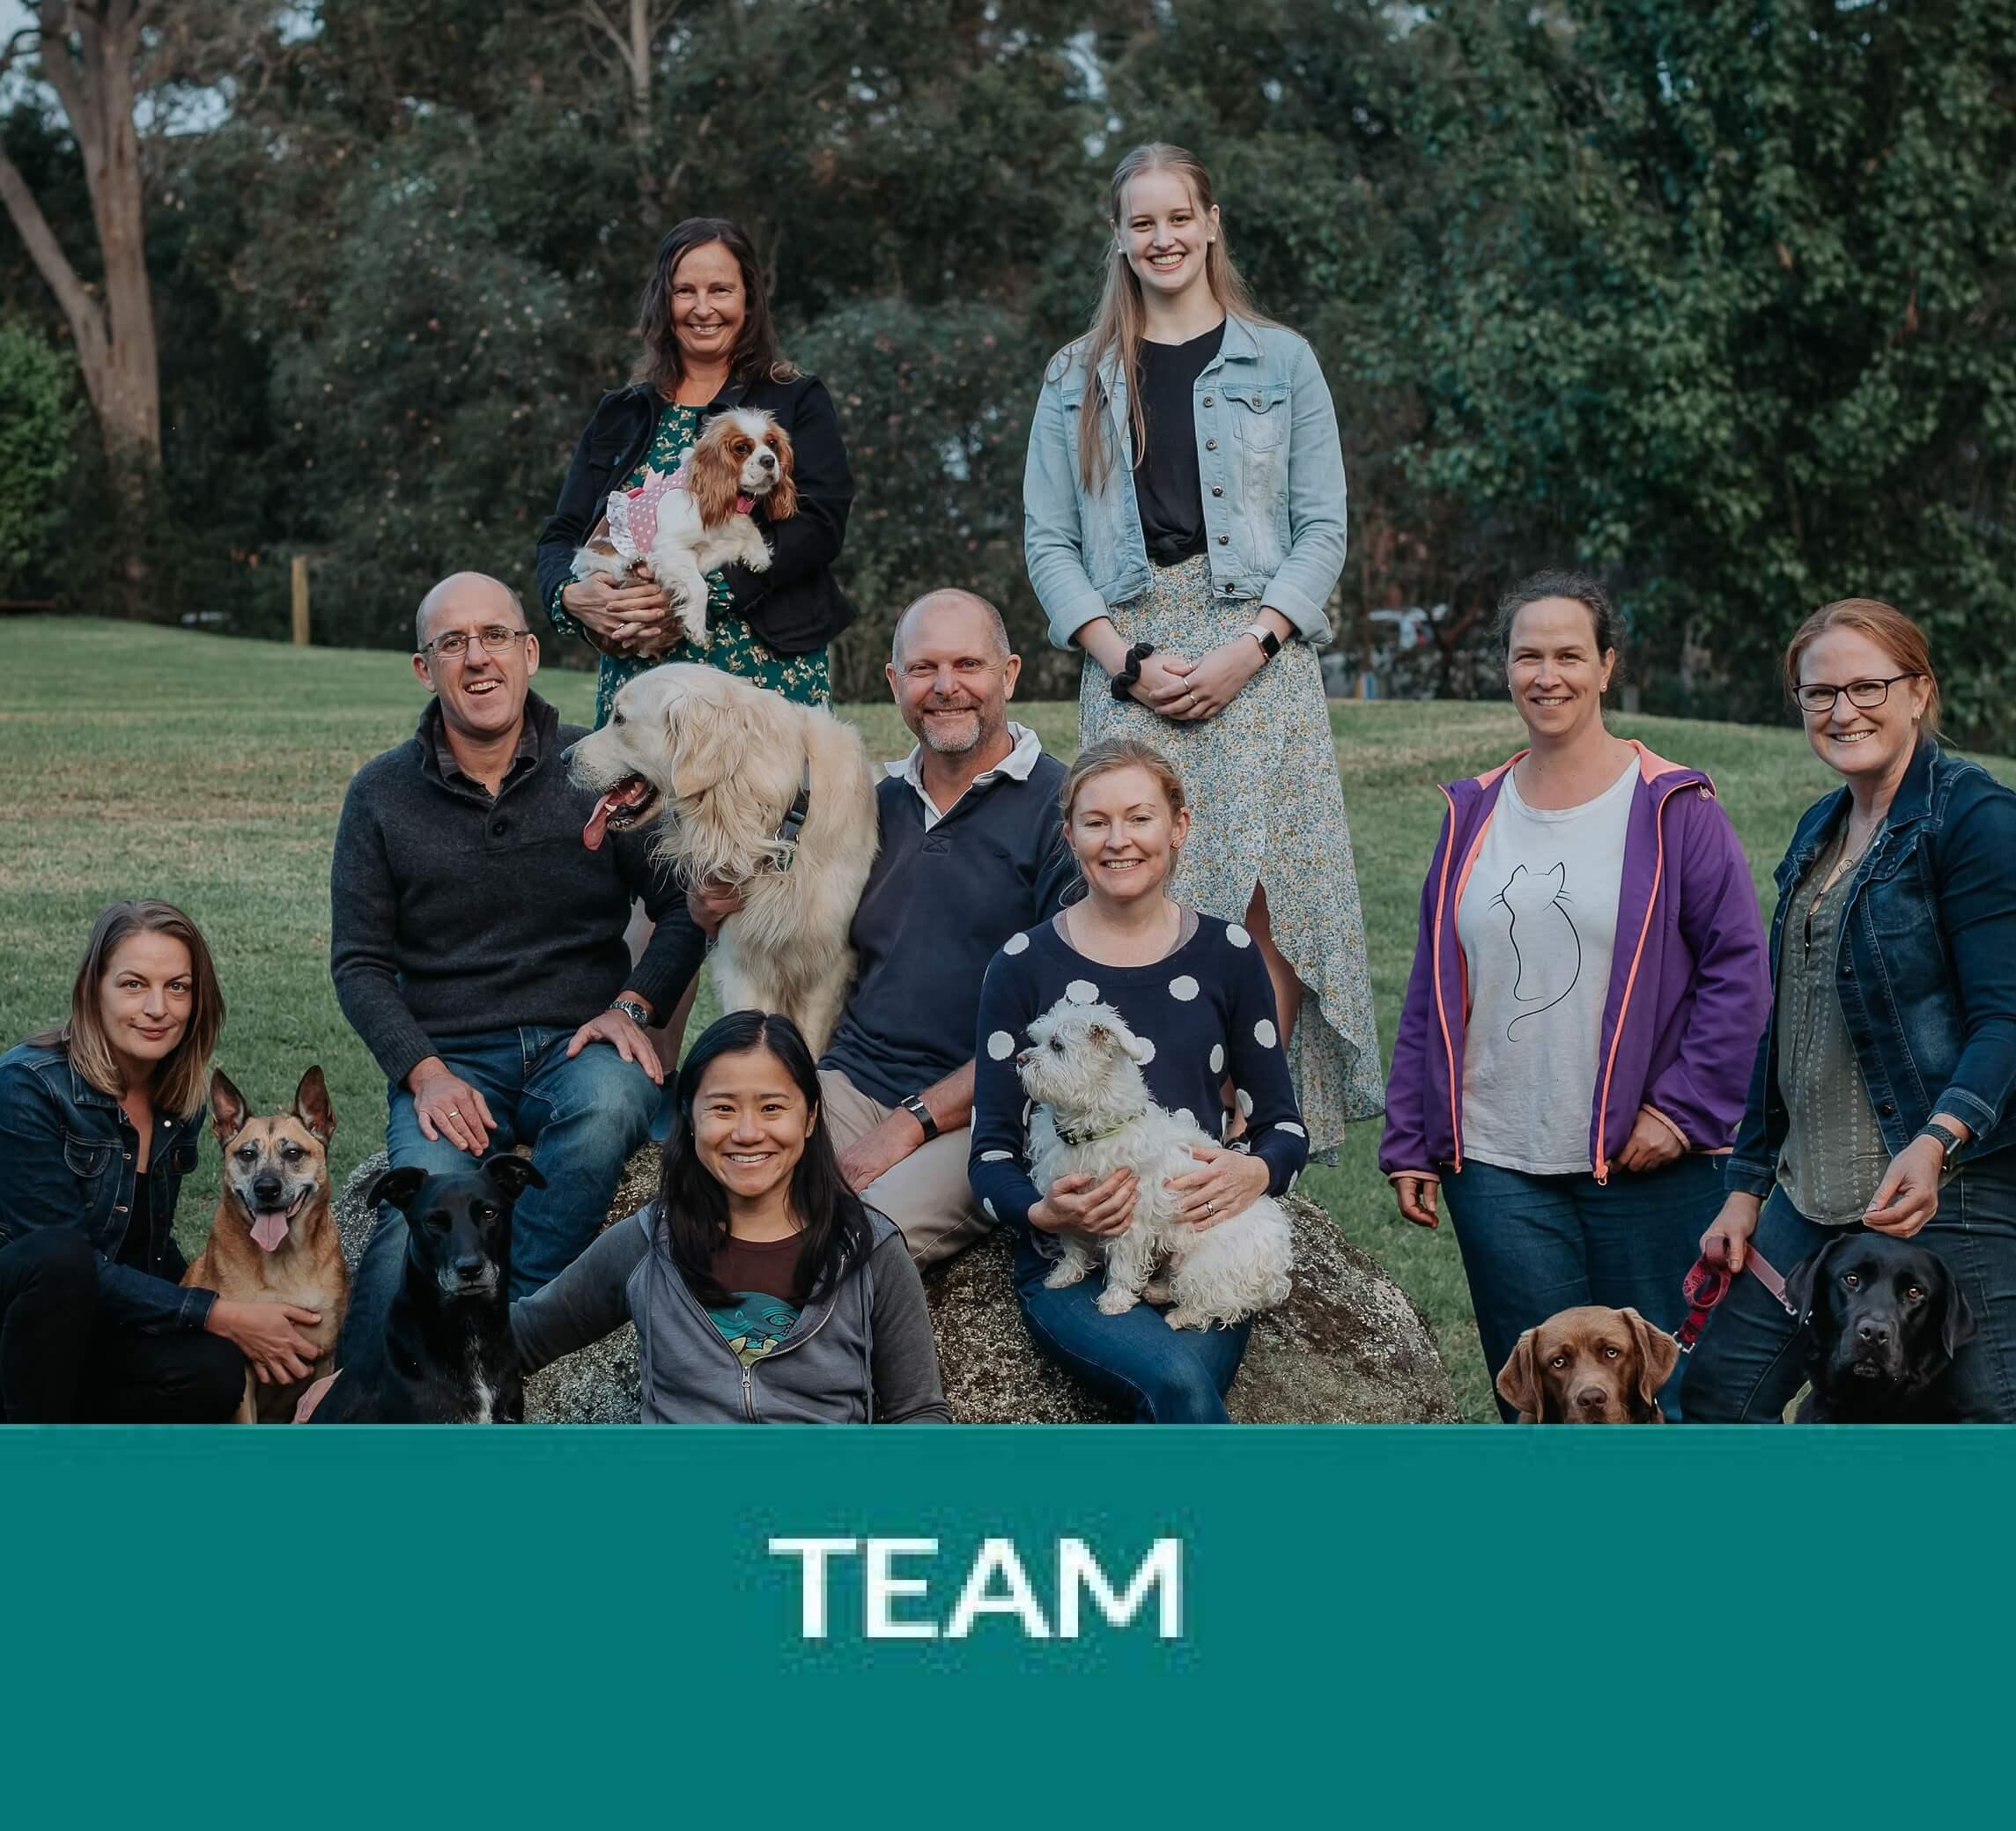 Our Team 2021